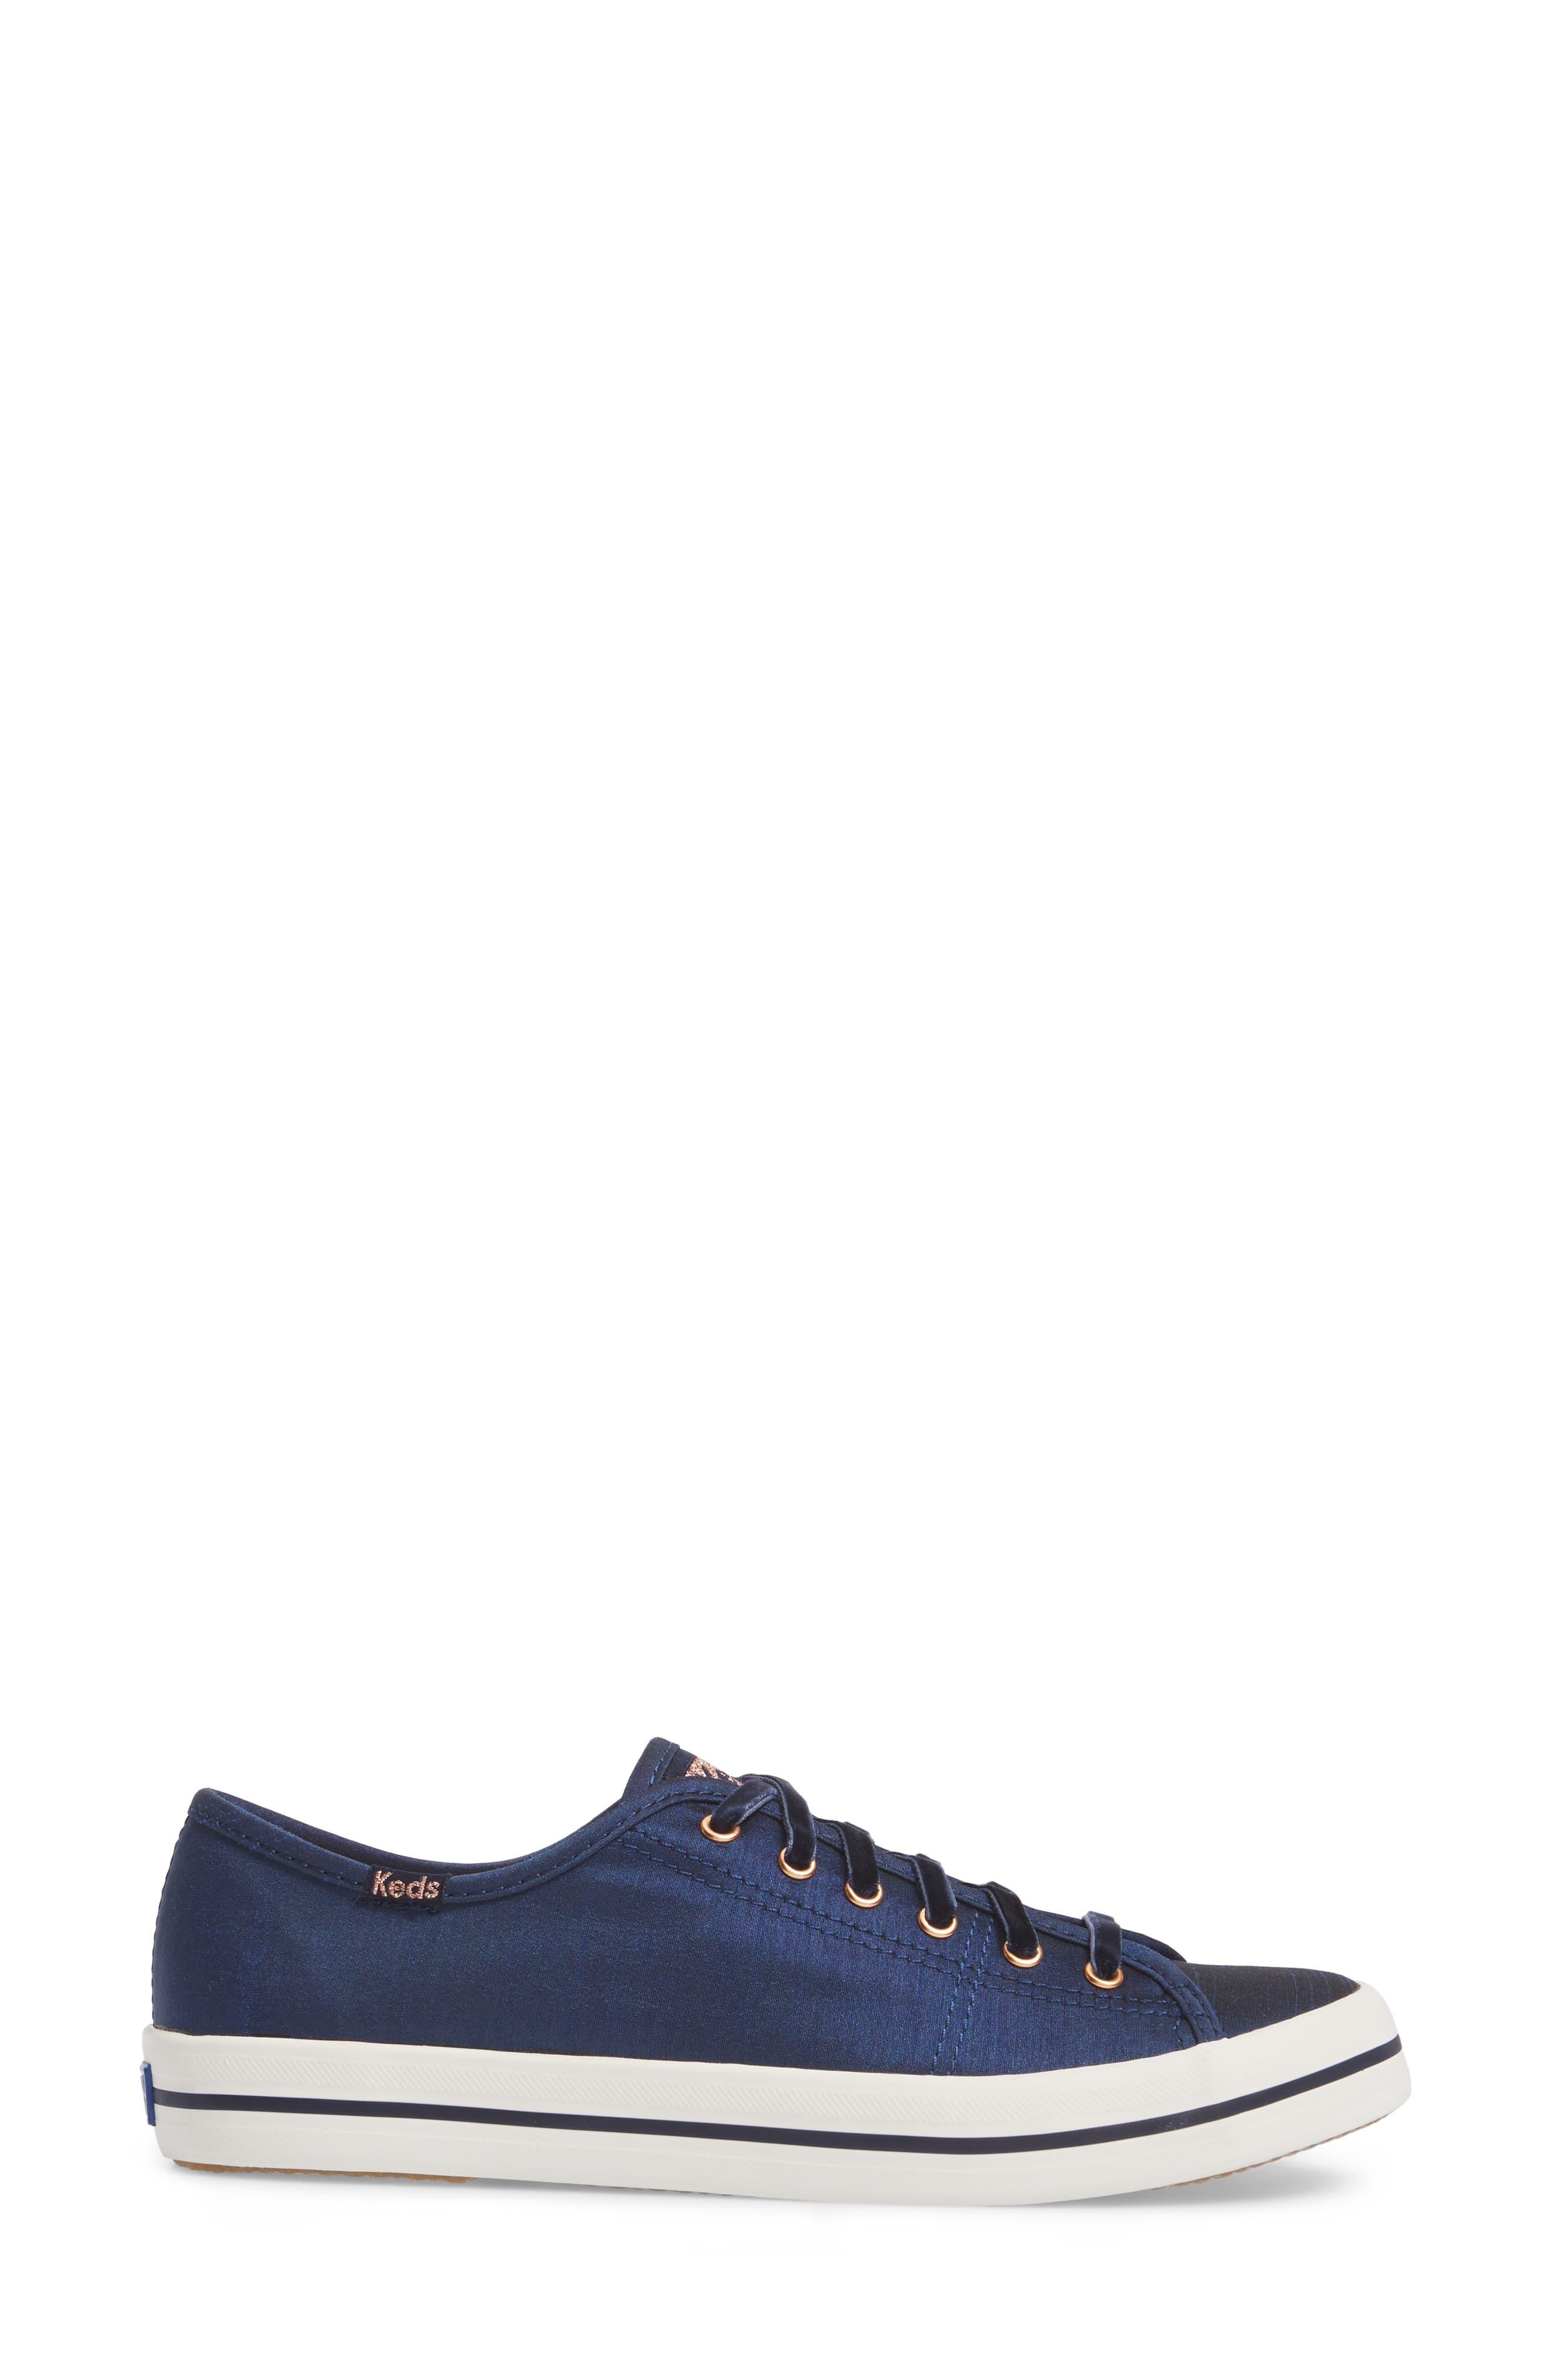 Kickstart Sneaker,                             Alternate thumbnail 3, color,                             Navy Satin